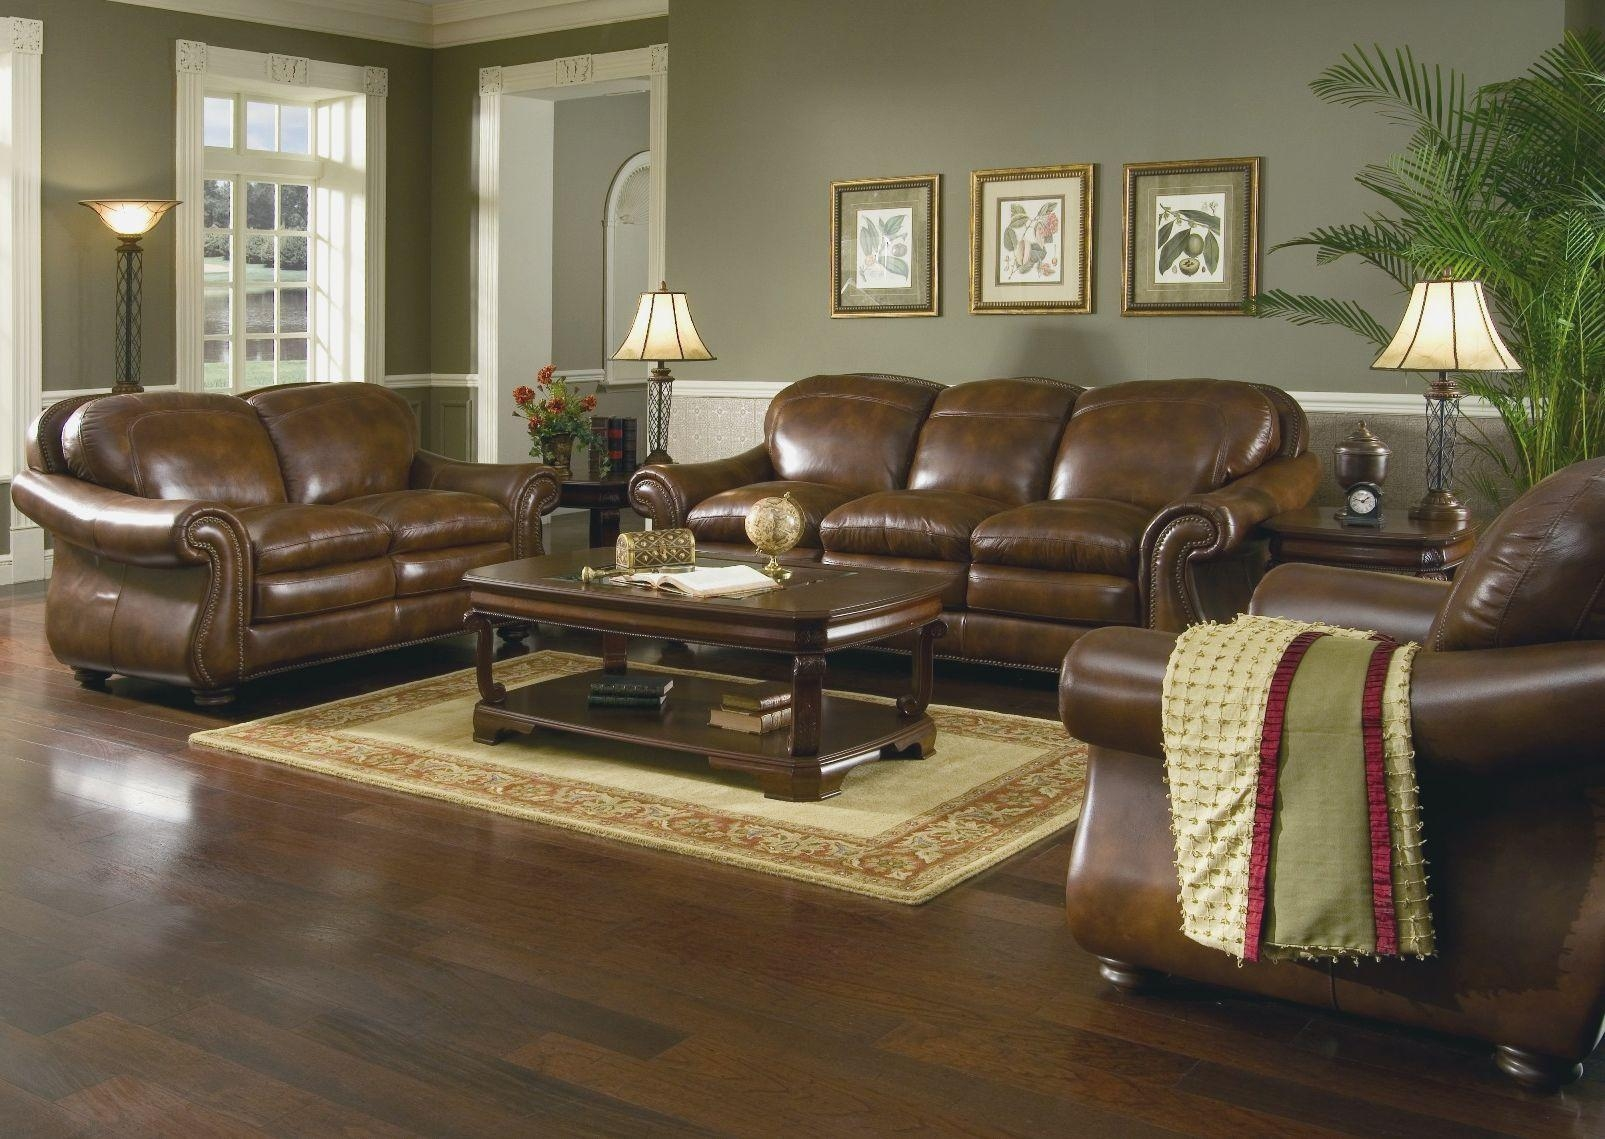 Interesting 90+ Chocolate Brown Sofa Living Room Ideas Decorating In Living Room With Brown Sofas (View 5 of 20)